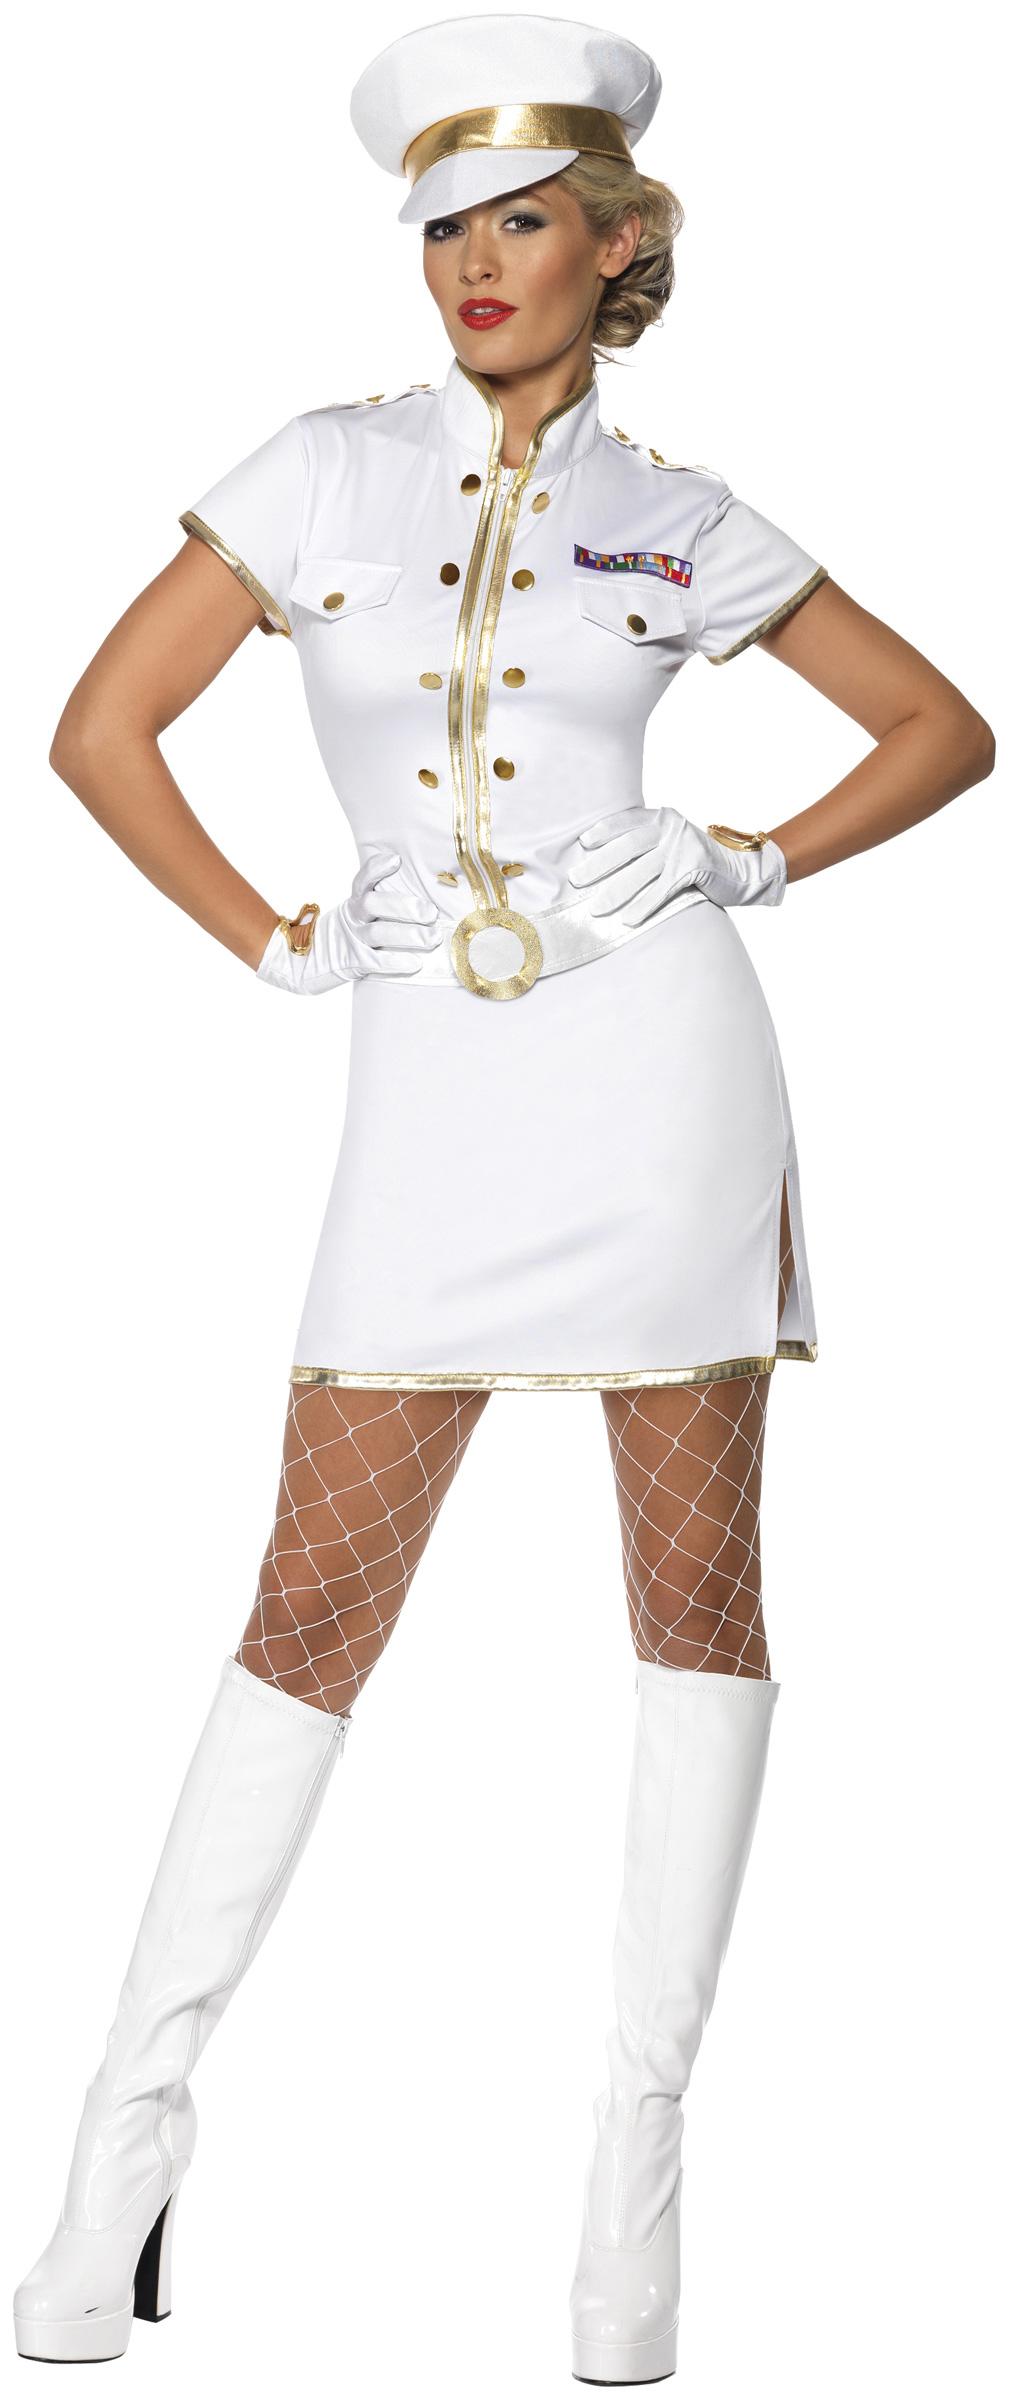 photo déguisement femme navy